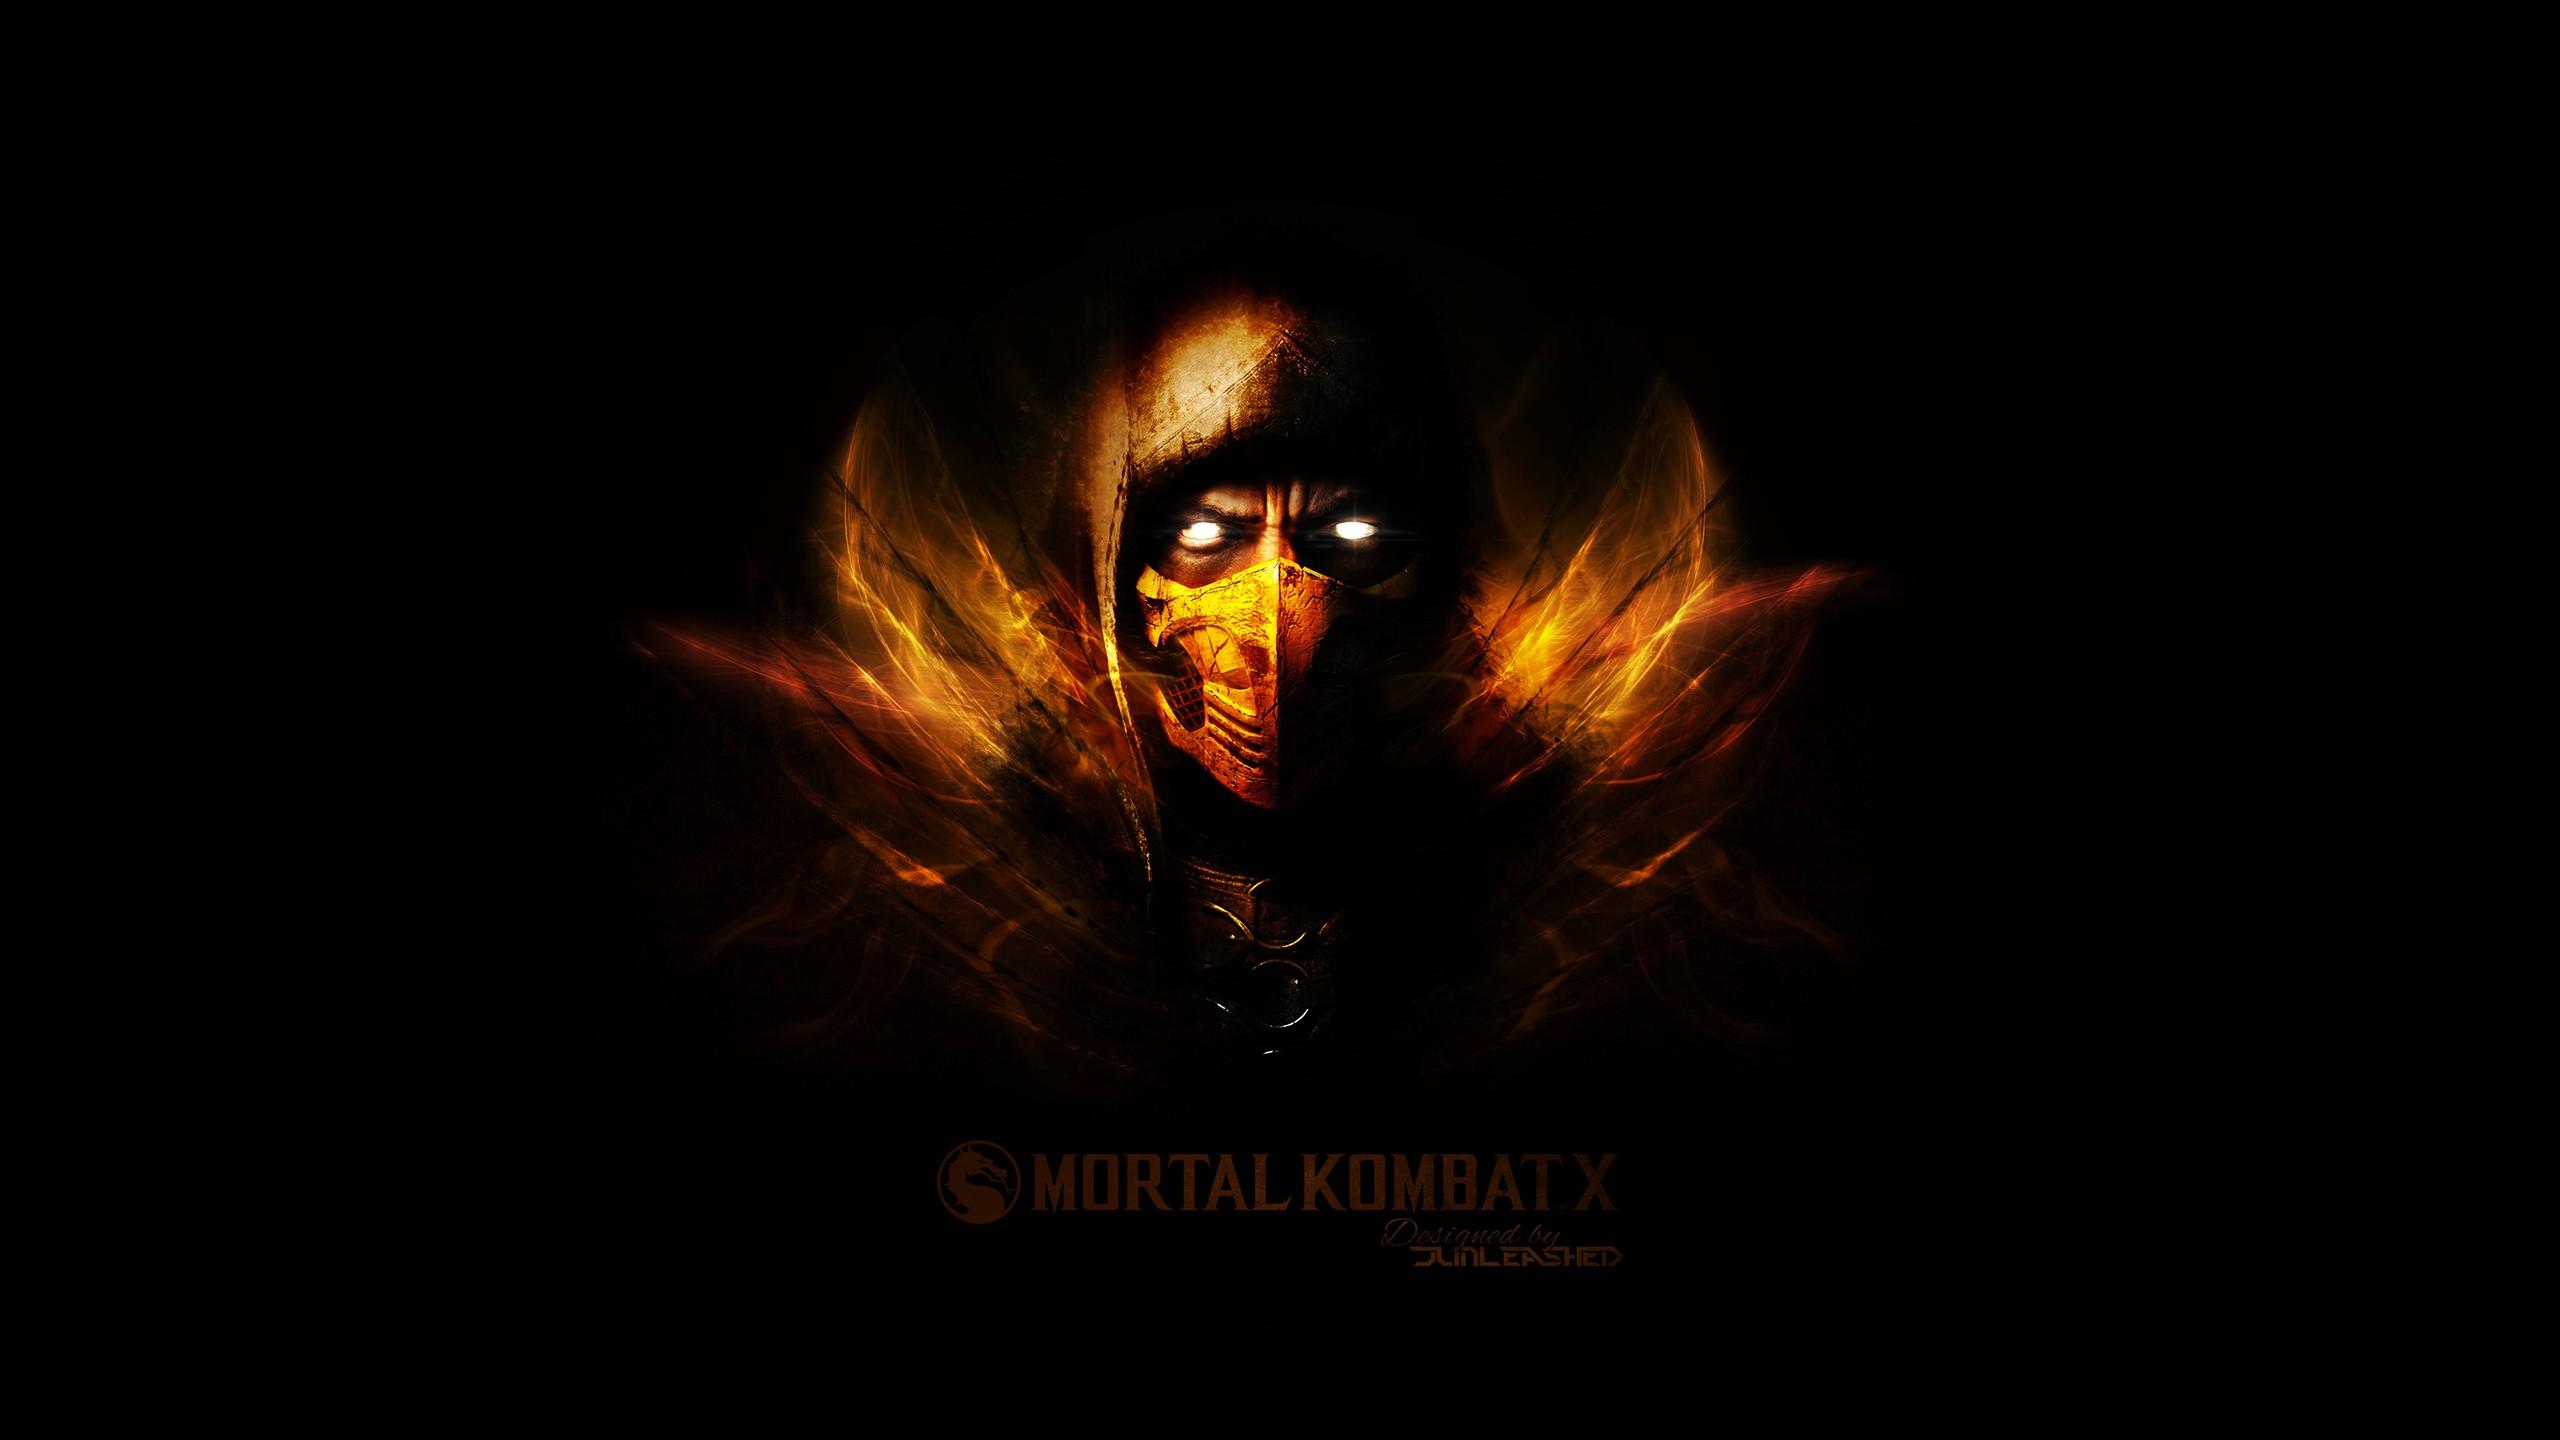 2560x1440 Px Mortal Kombat X